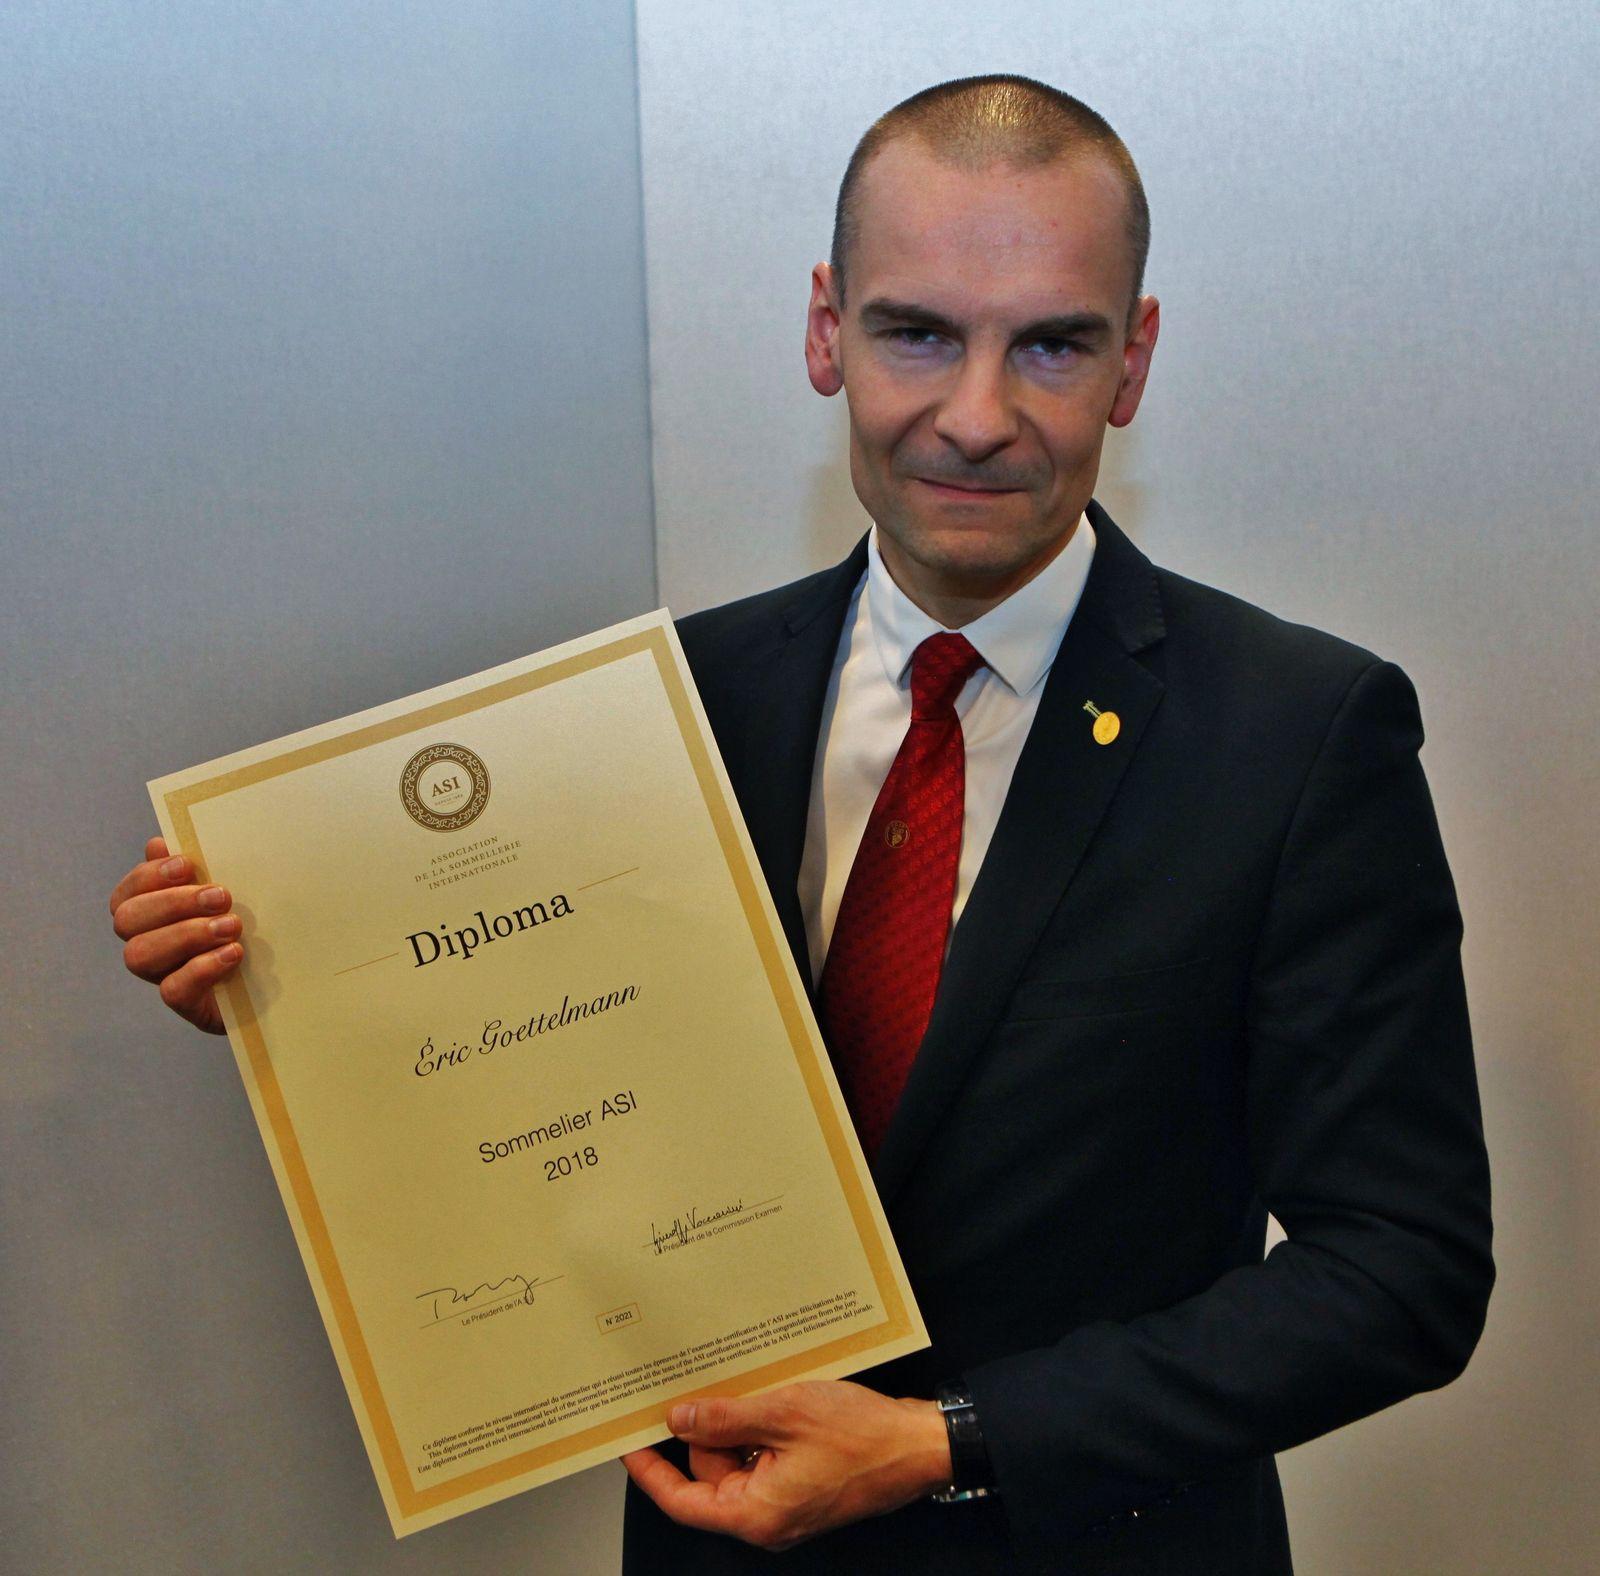 Médaille d'or en 2018, Eric Goettelmann organise la Certification en France depuis 2020. (JB)